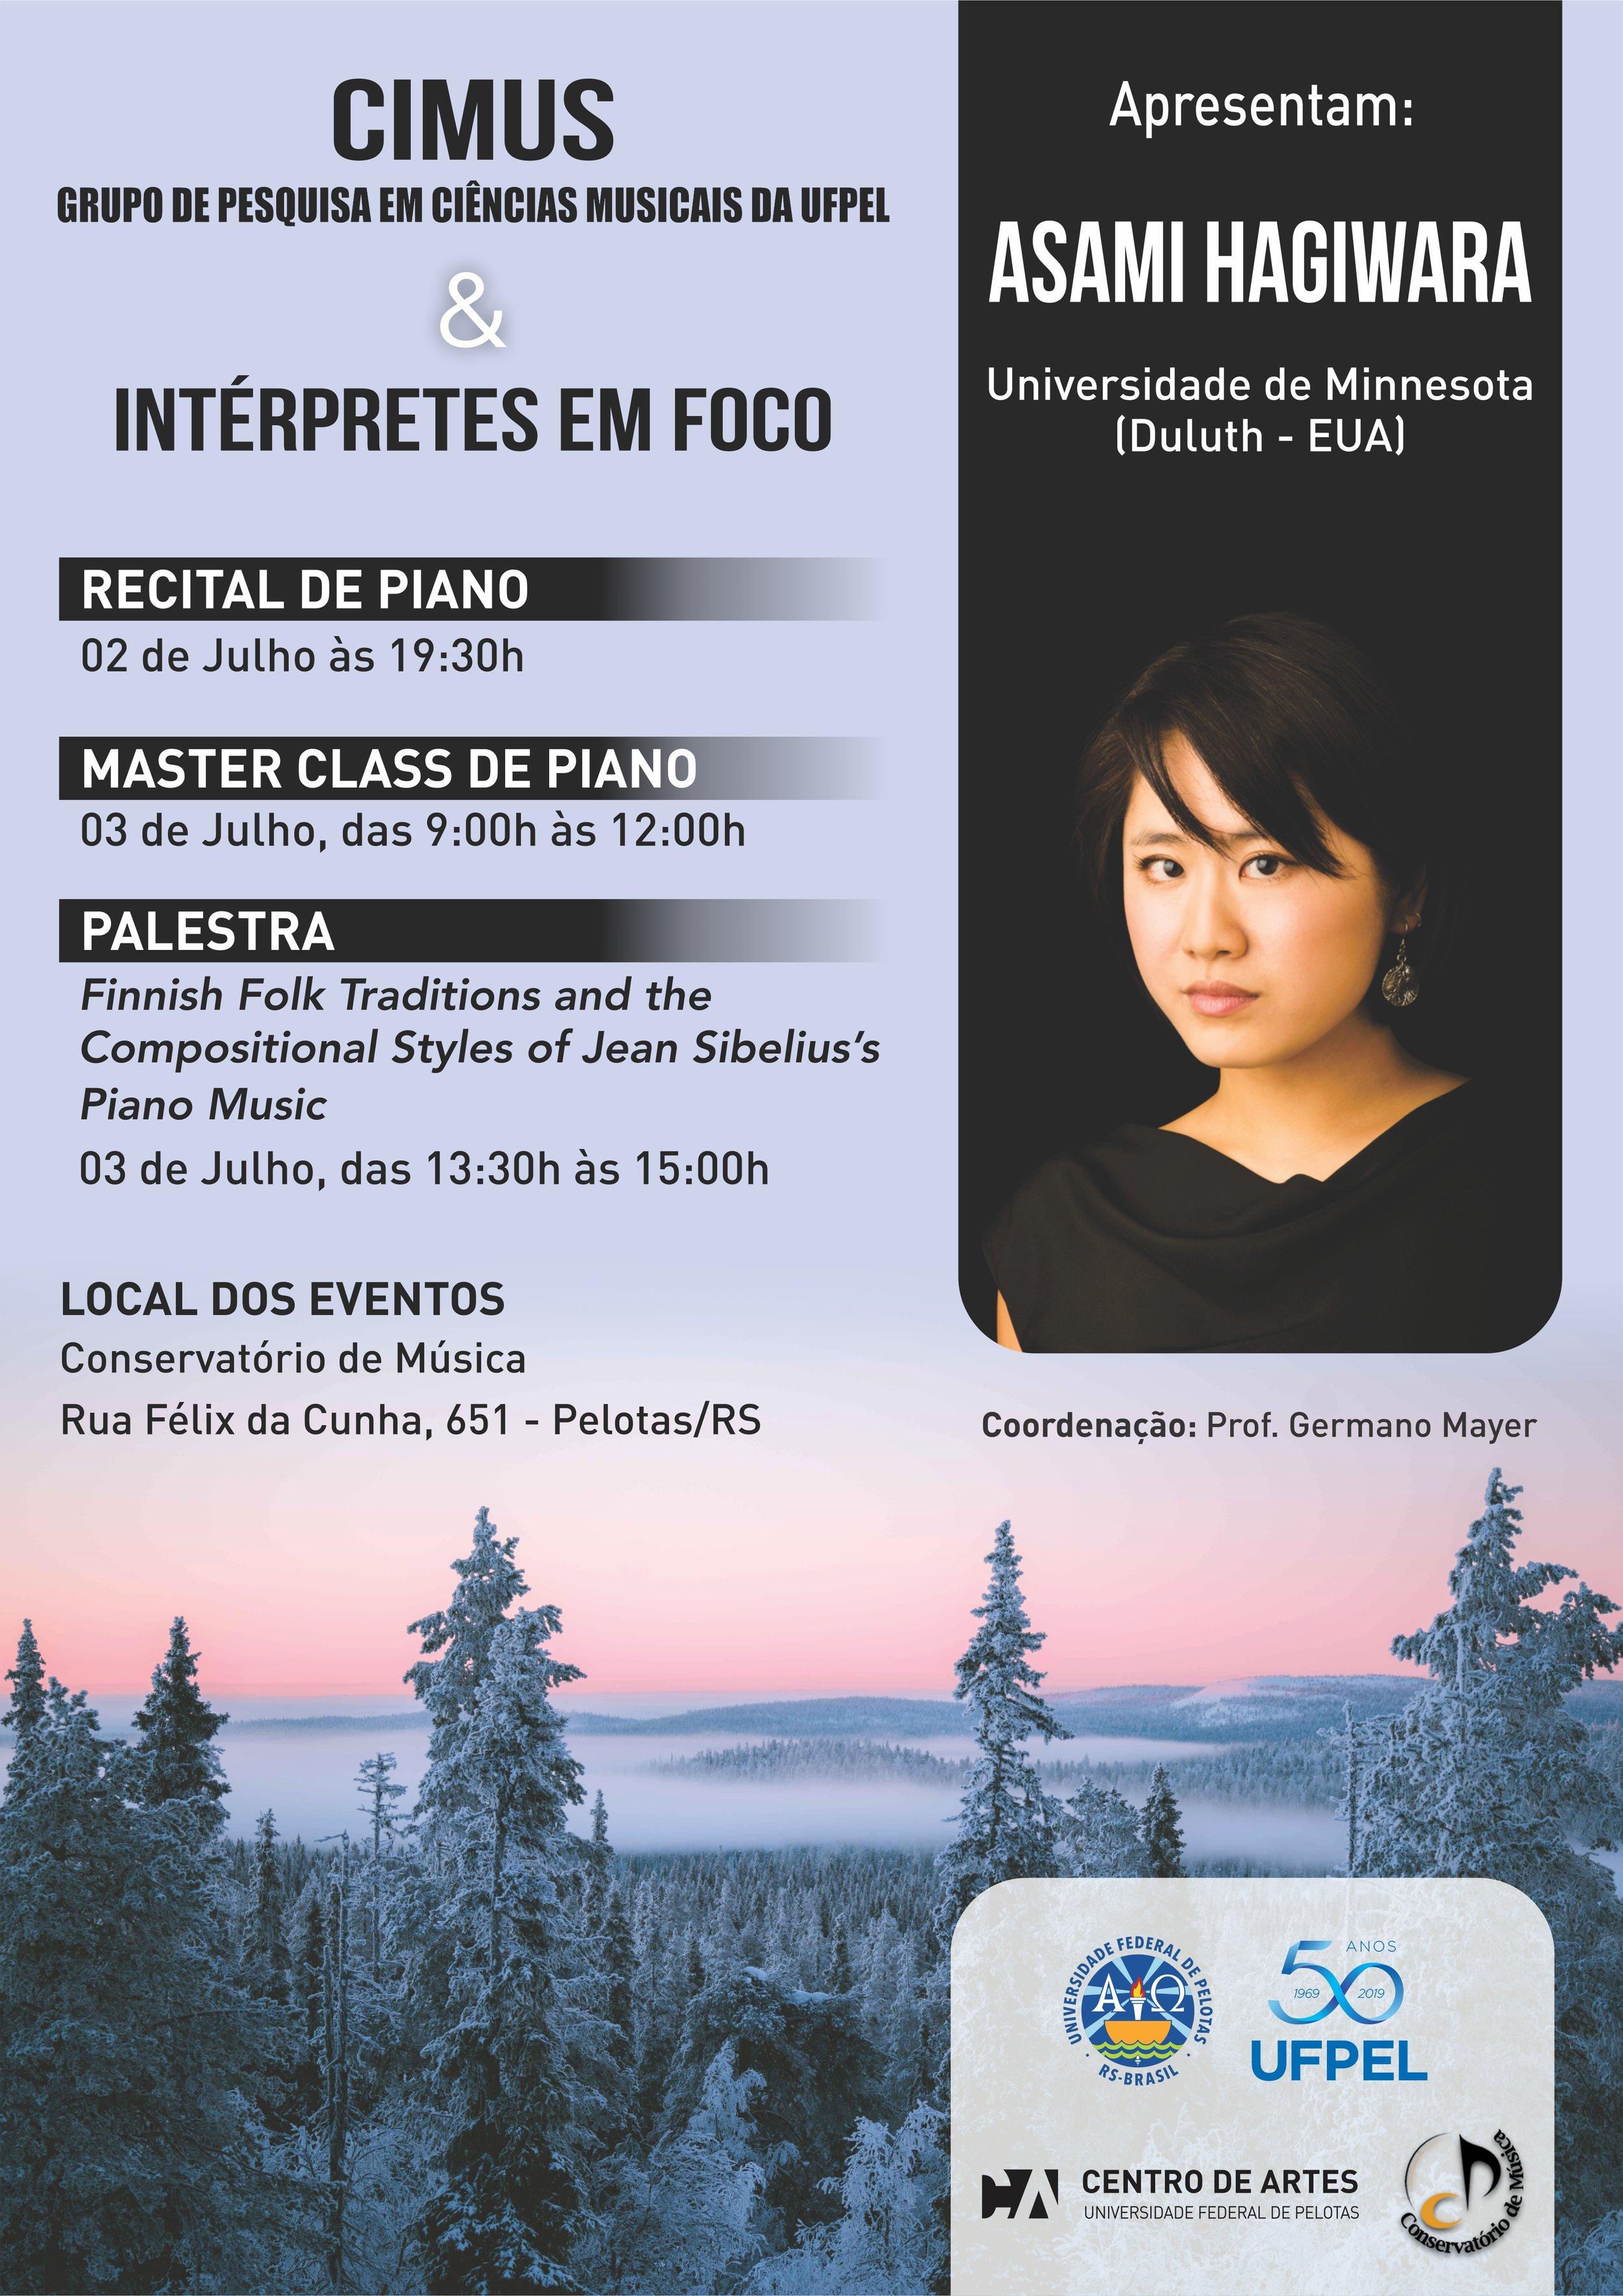 UFPEL Residency Poster (Pelotas, Brazil)